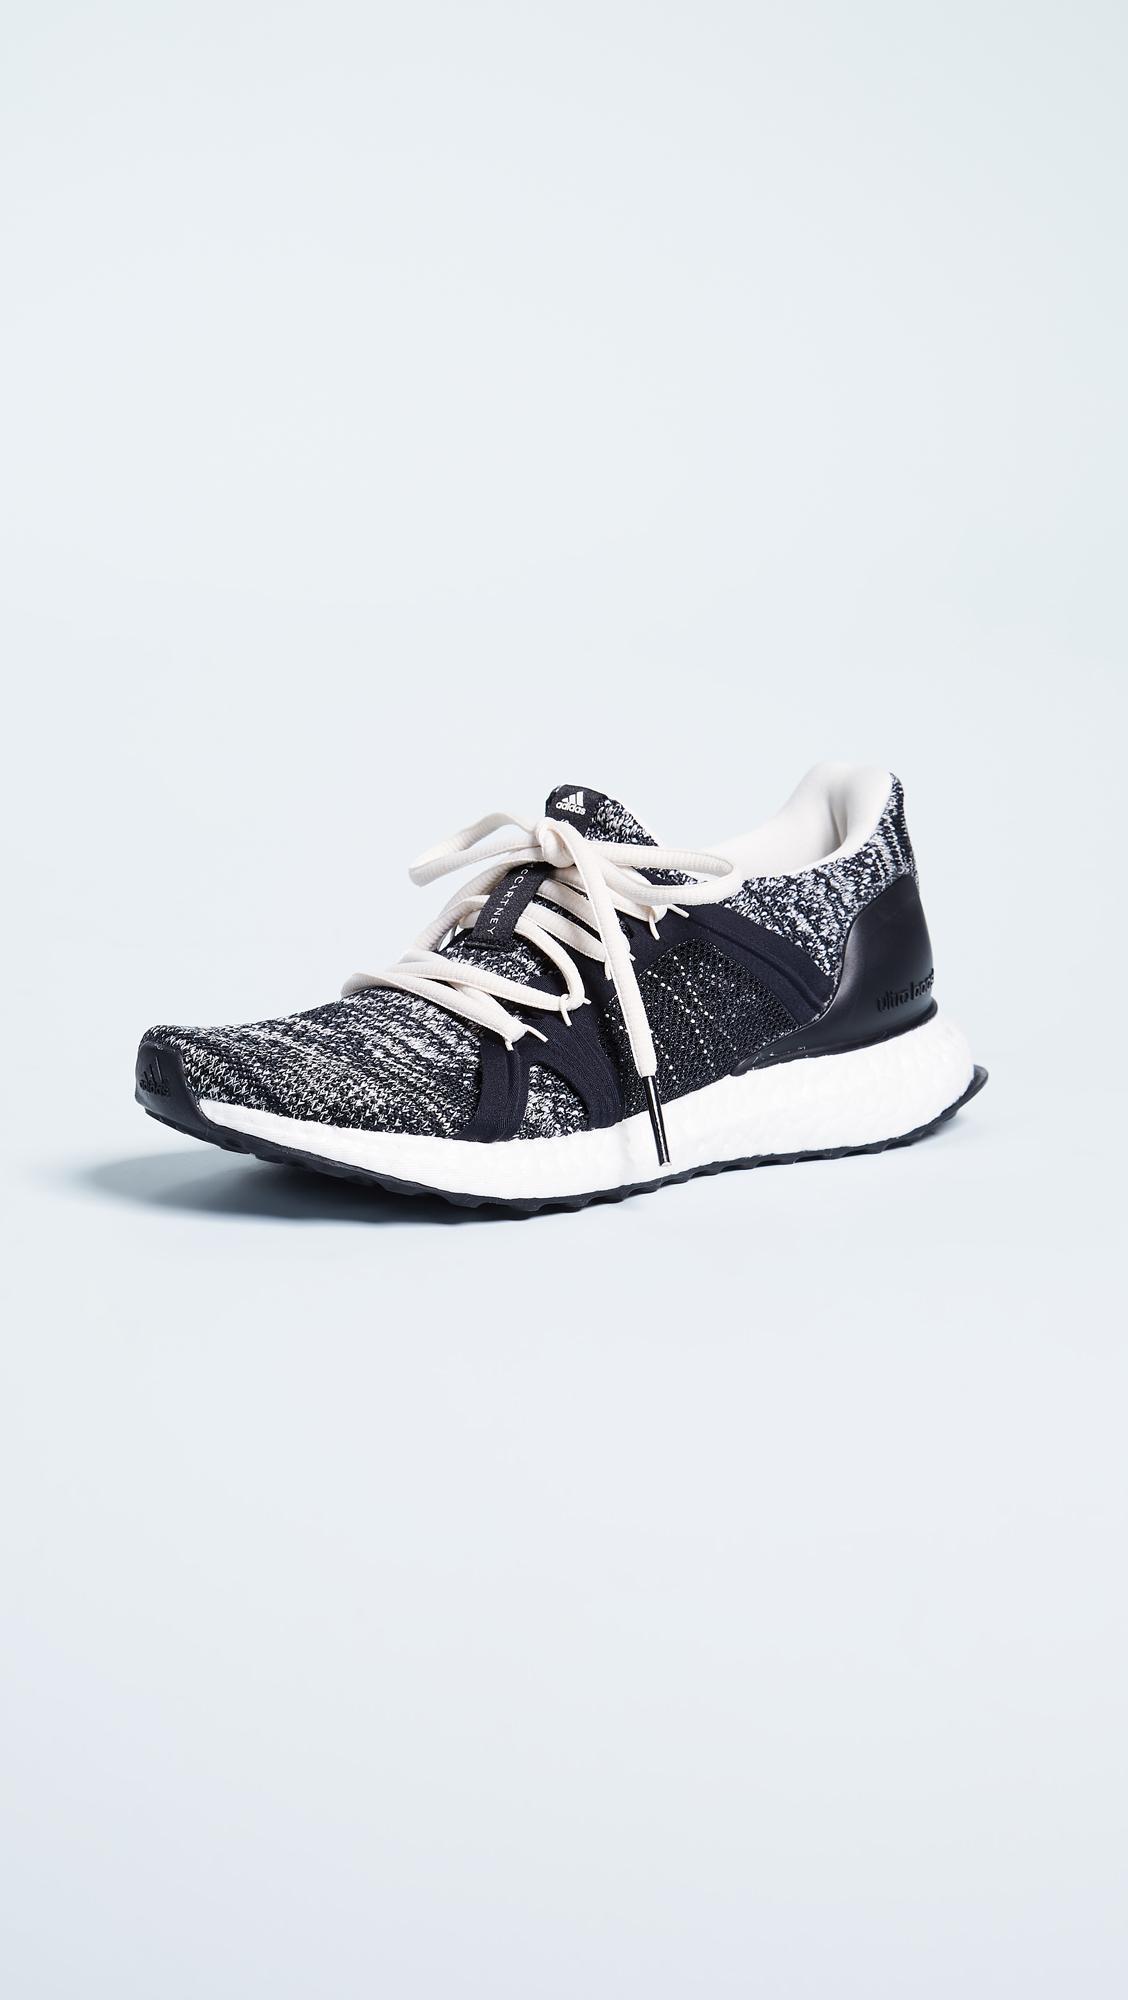 7d99c673a13 adidas By Stella McCartney Ultraboost Parley Sneakers in Black - Lyst